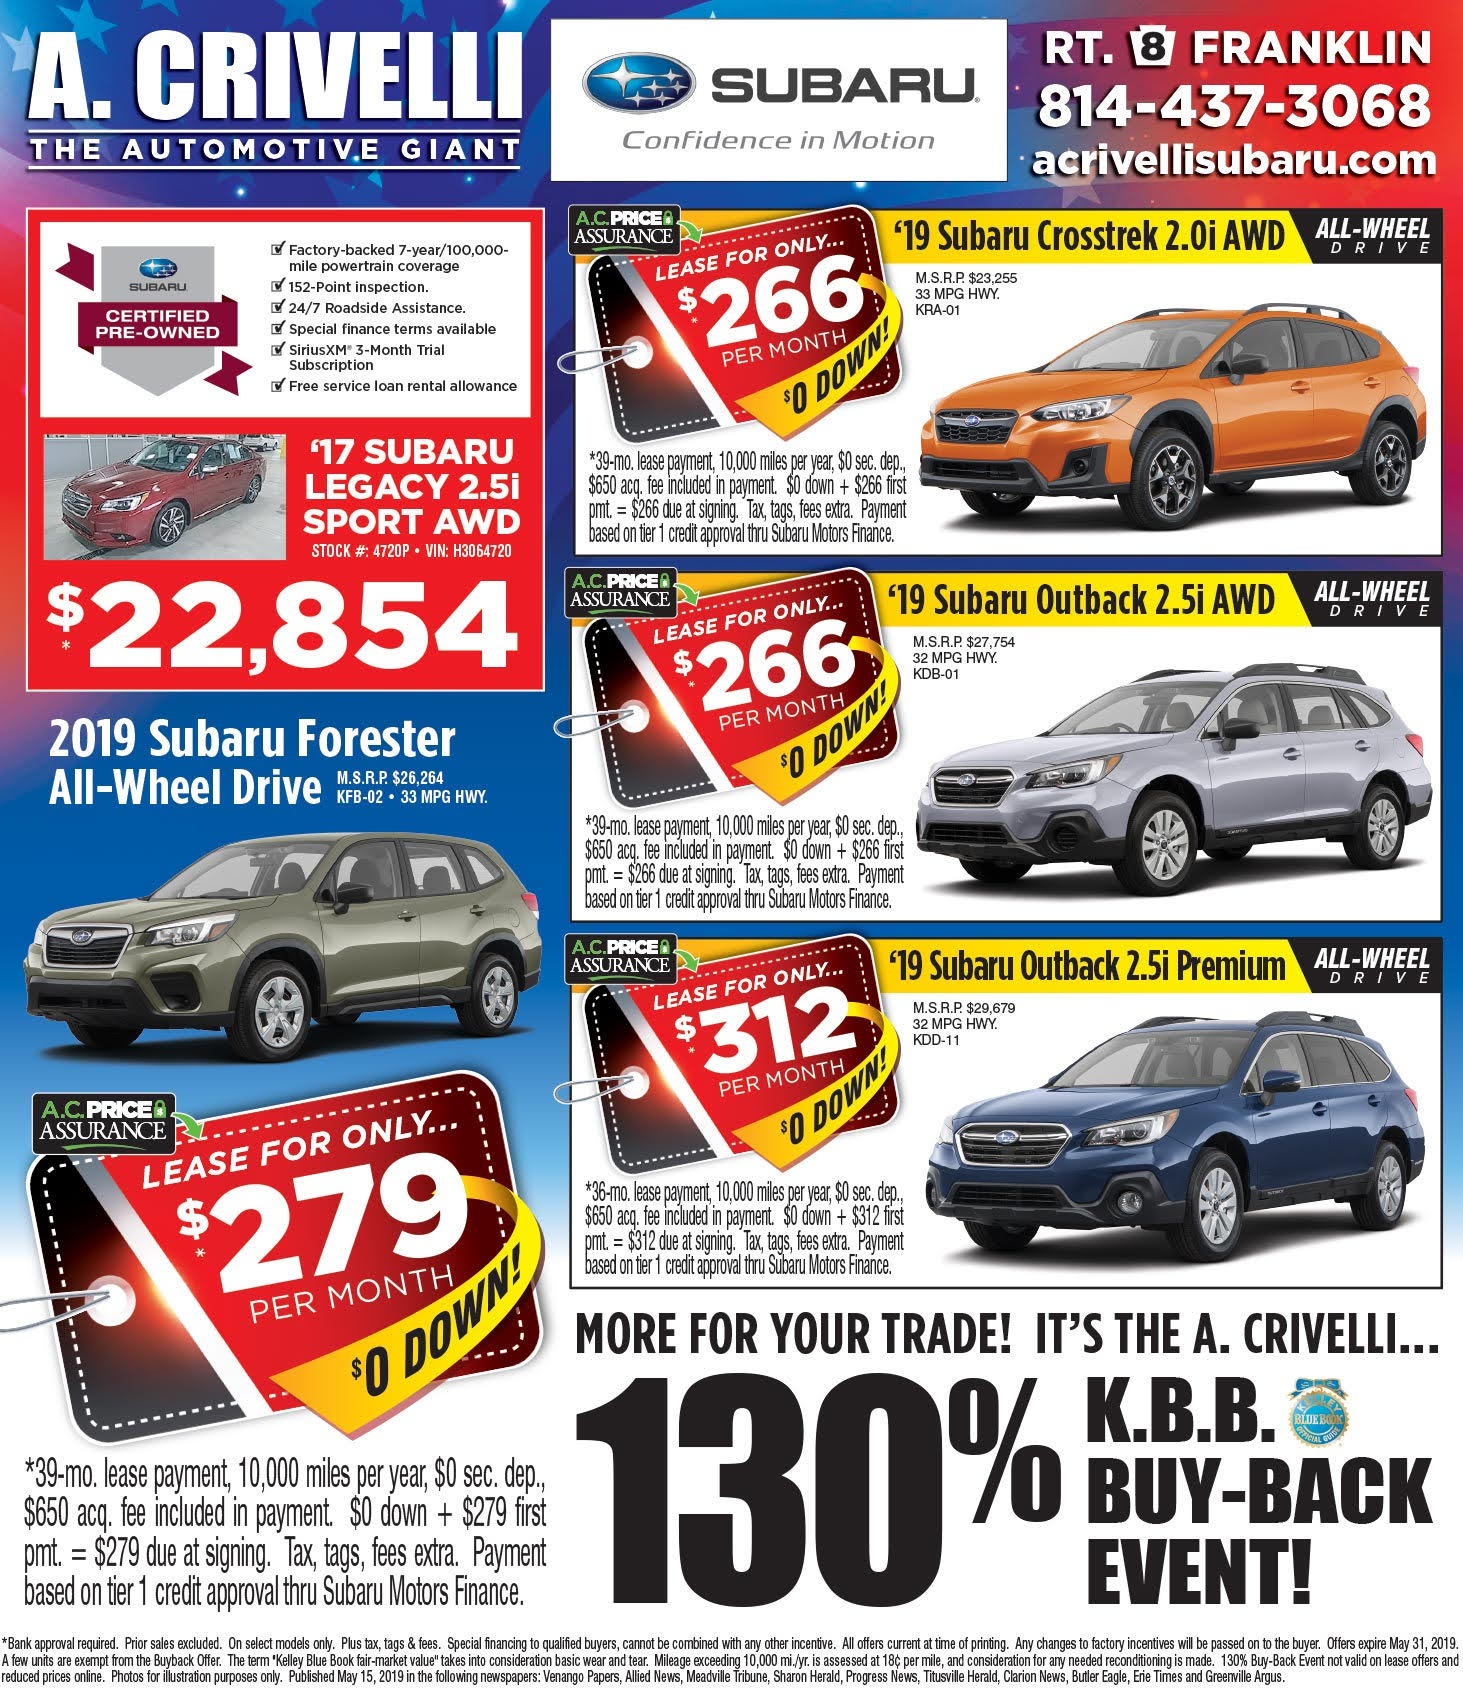 A Crivelli Subaru >> Weekly Ad A Crivelli Subaru